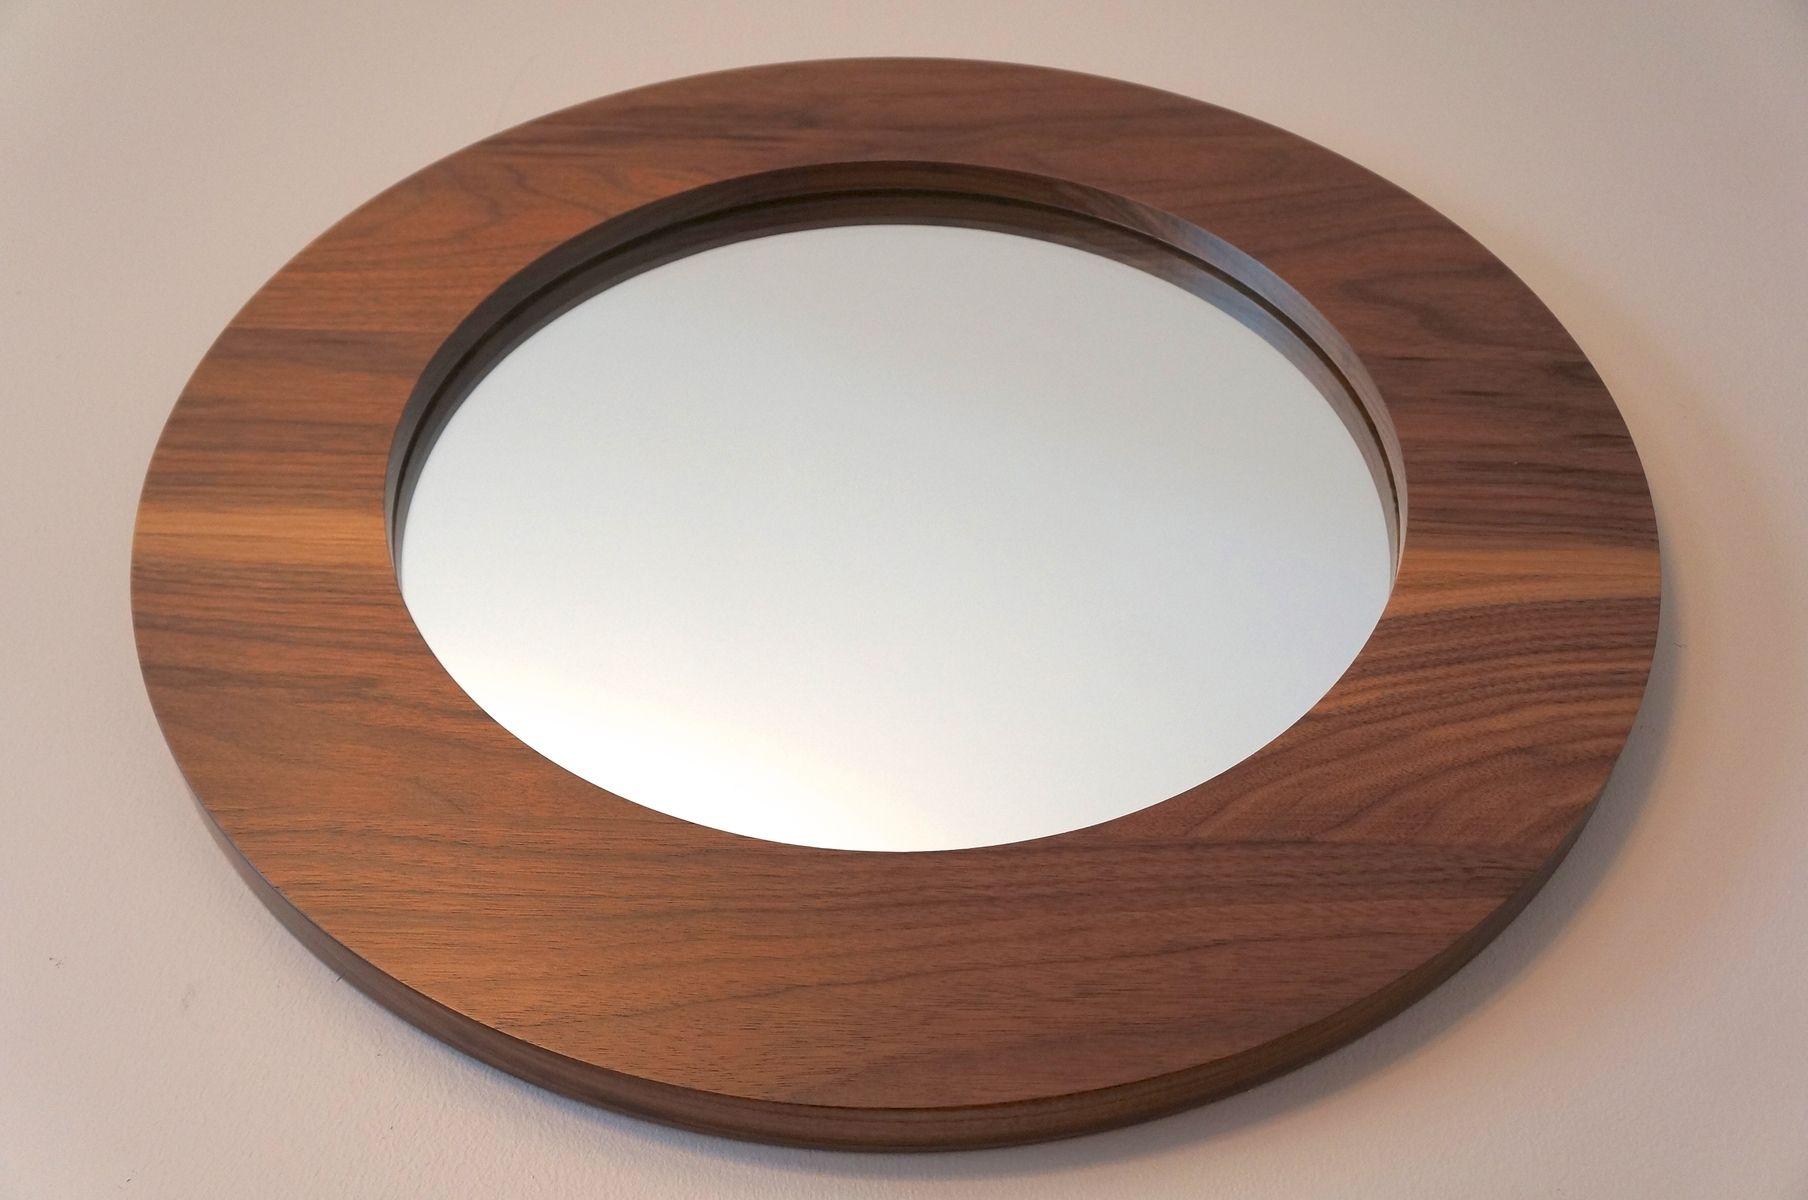 tags round inspirational decorative mirrors of small decor wall amazon mirror